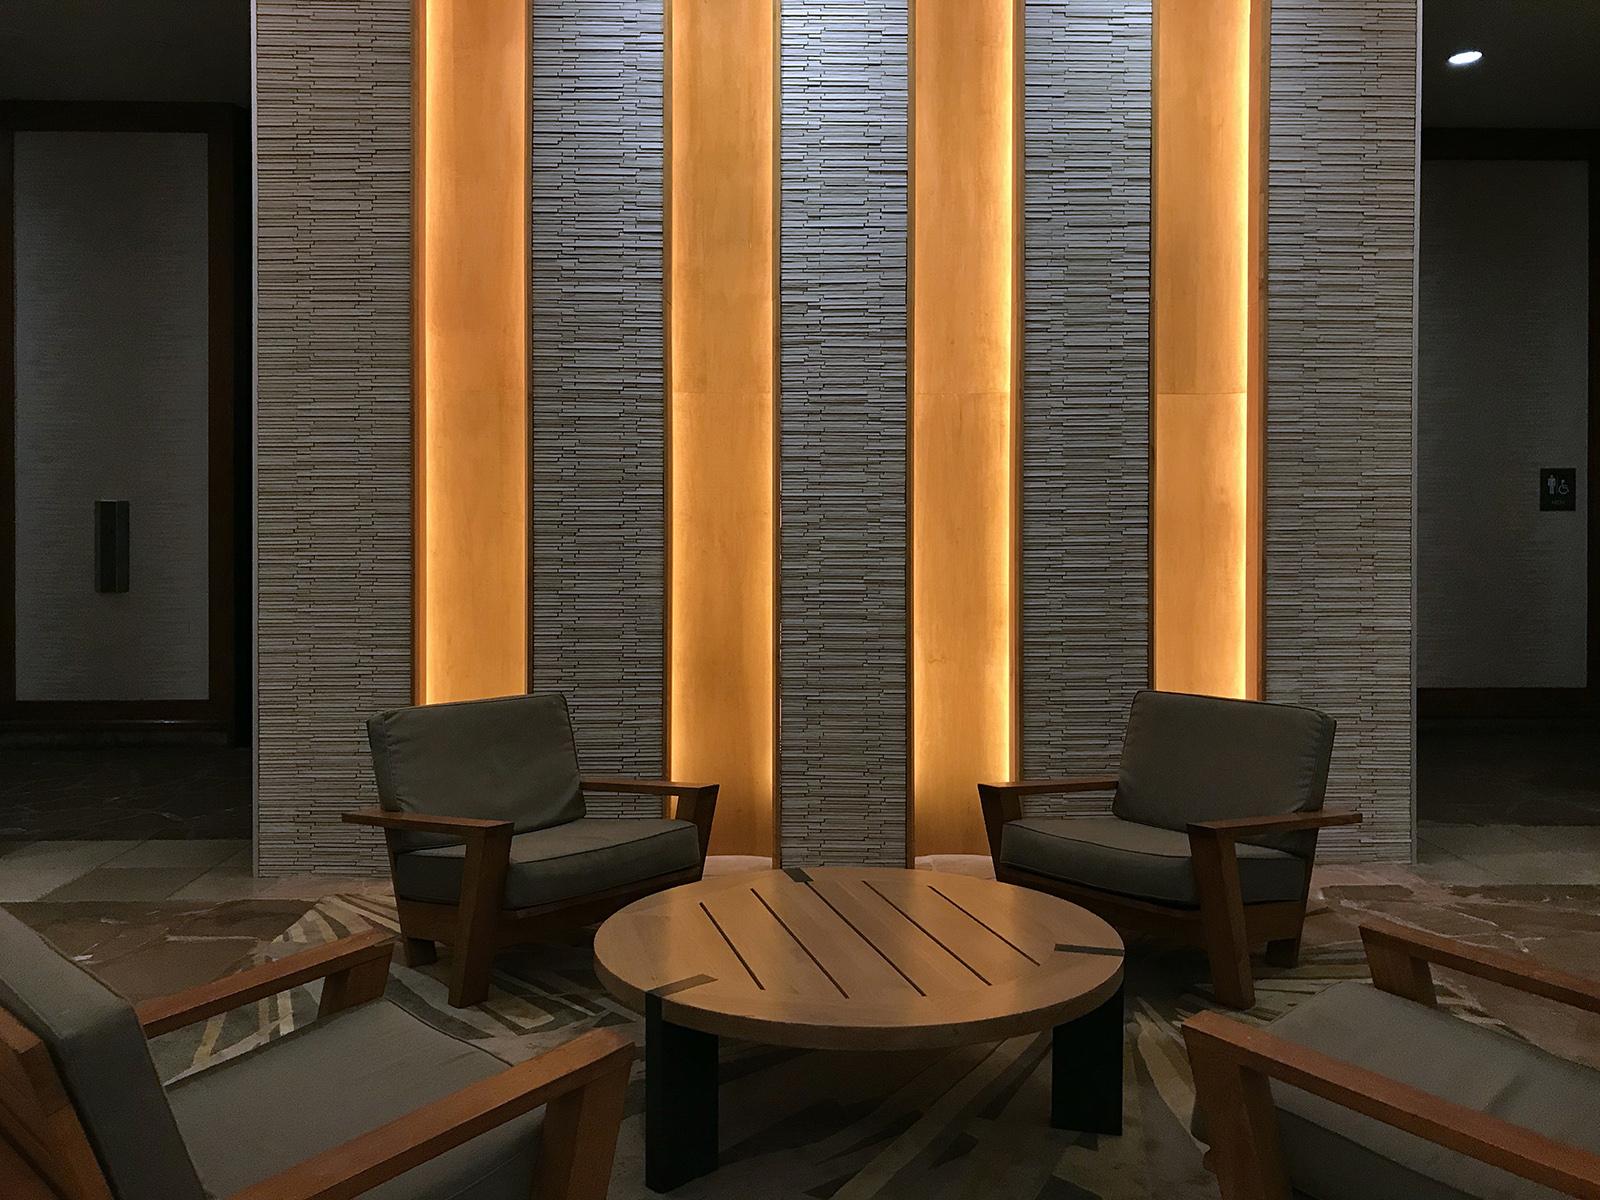 Hotel foyer, Hyatt, Maui 2019